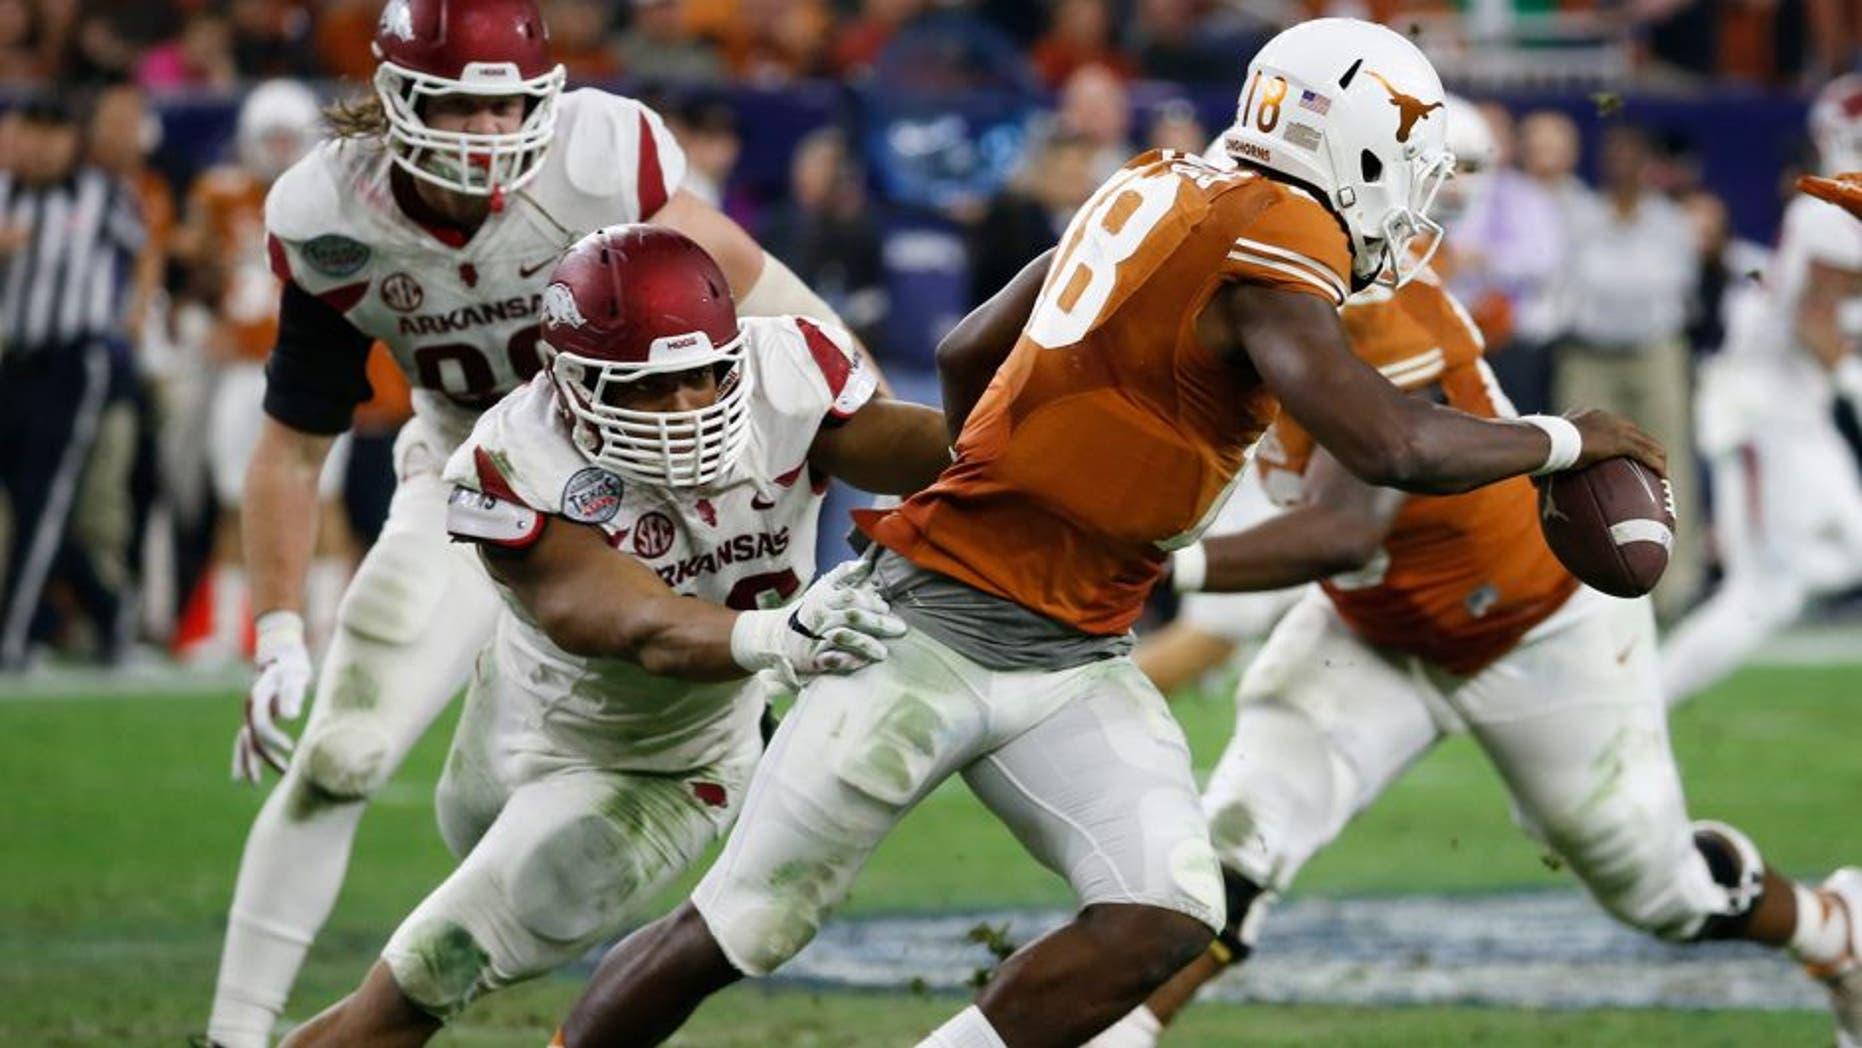 Dec 29, 2014; Houston, TX, USA; Arkansas Razorbacks defensive end Trey Flowers (86) sacks Texas Longhorns quarterback Tyrone Swoopes (18) during the first half in the 2014 Texas Bowl at NRG Stadium. Mandatory Credit: Kevin Jairaj-USA TODAY Sports